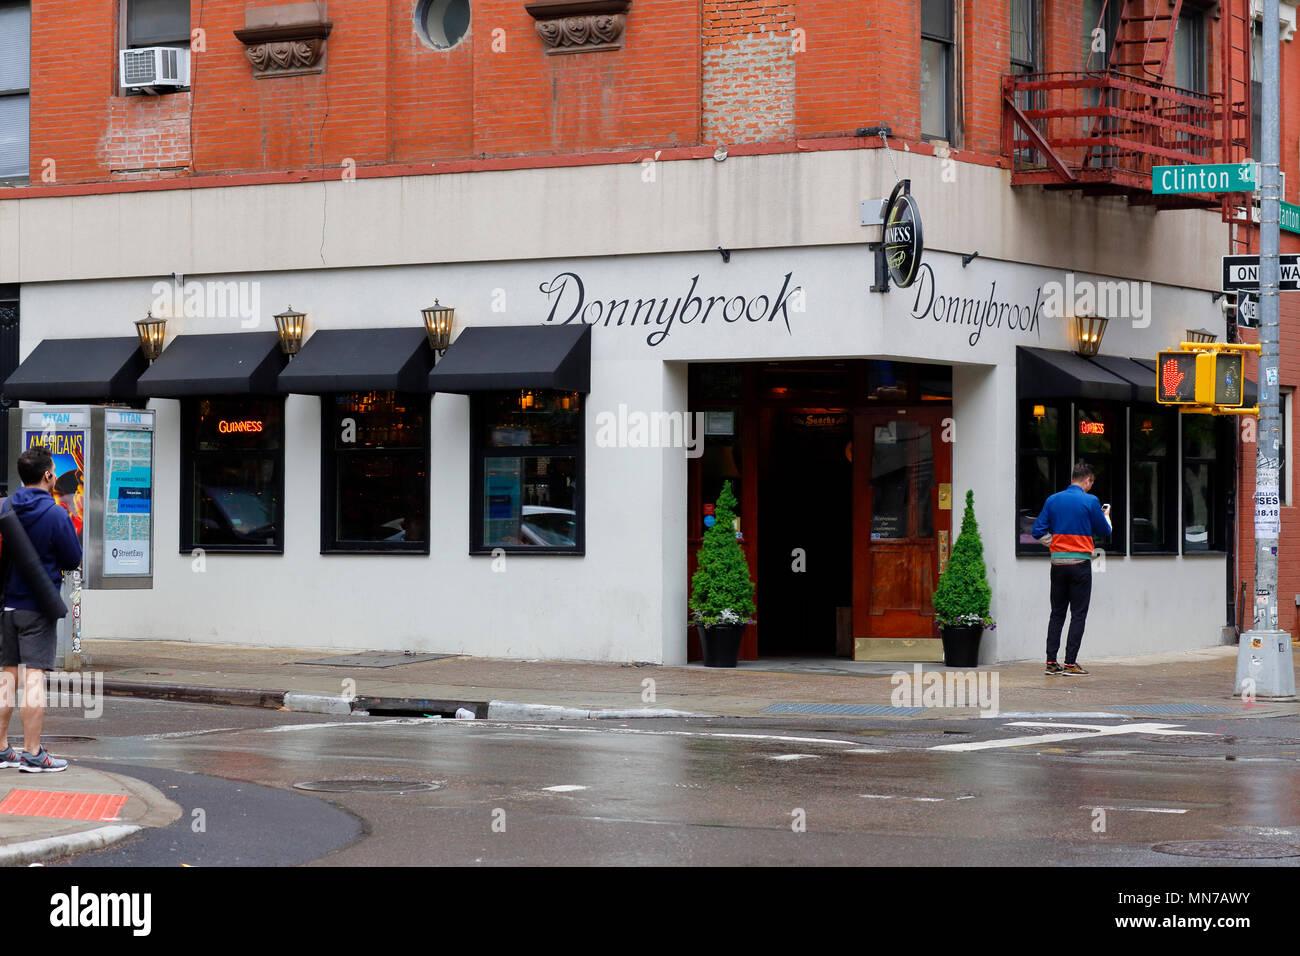 Donnybrook, 35 Clinton St, New York, NY - Stock Image